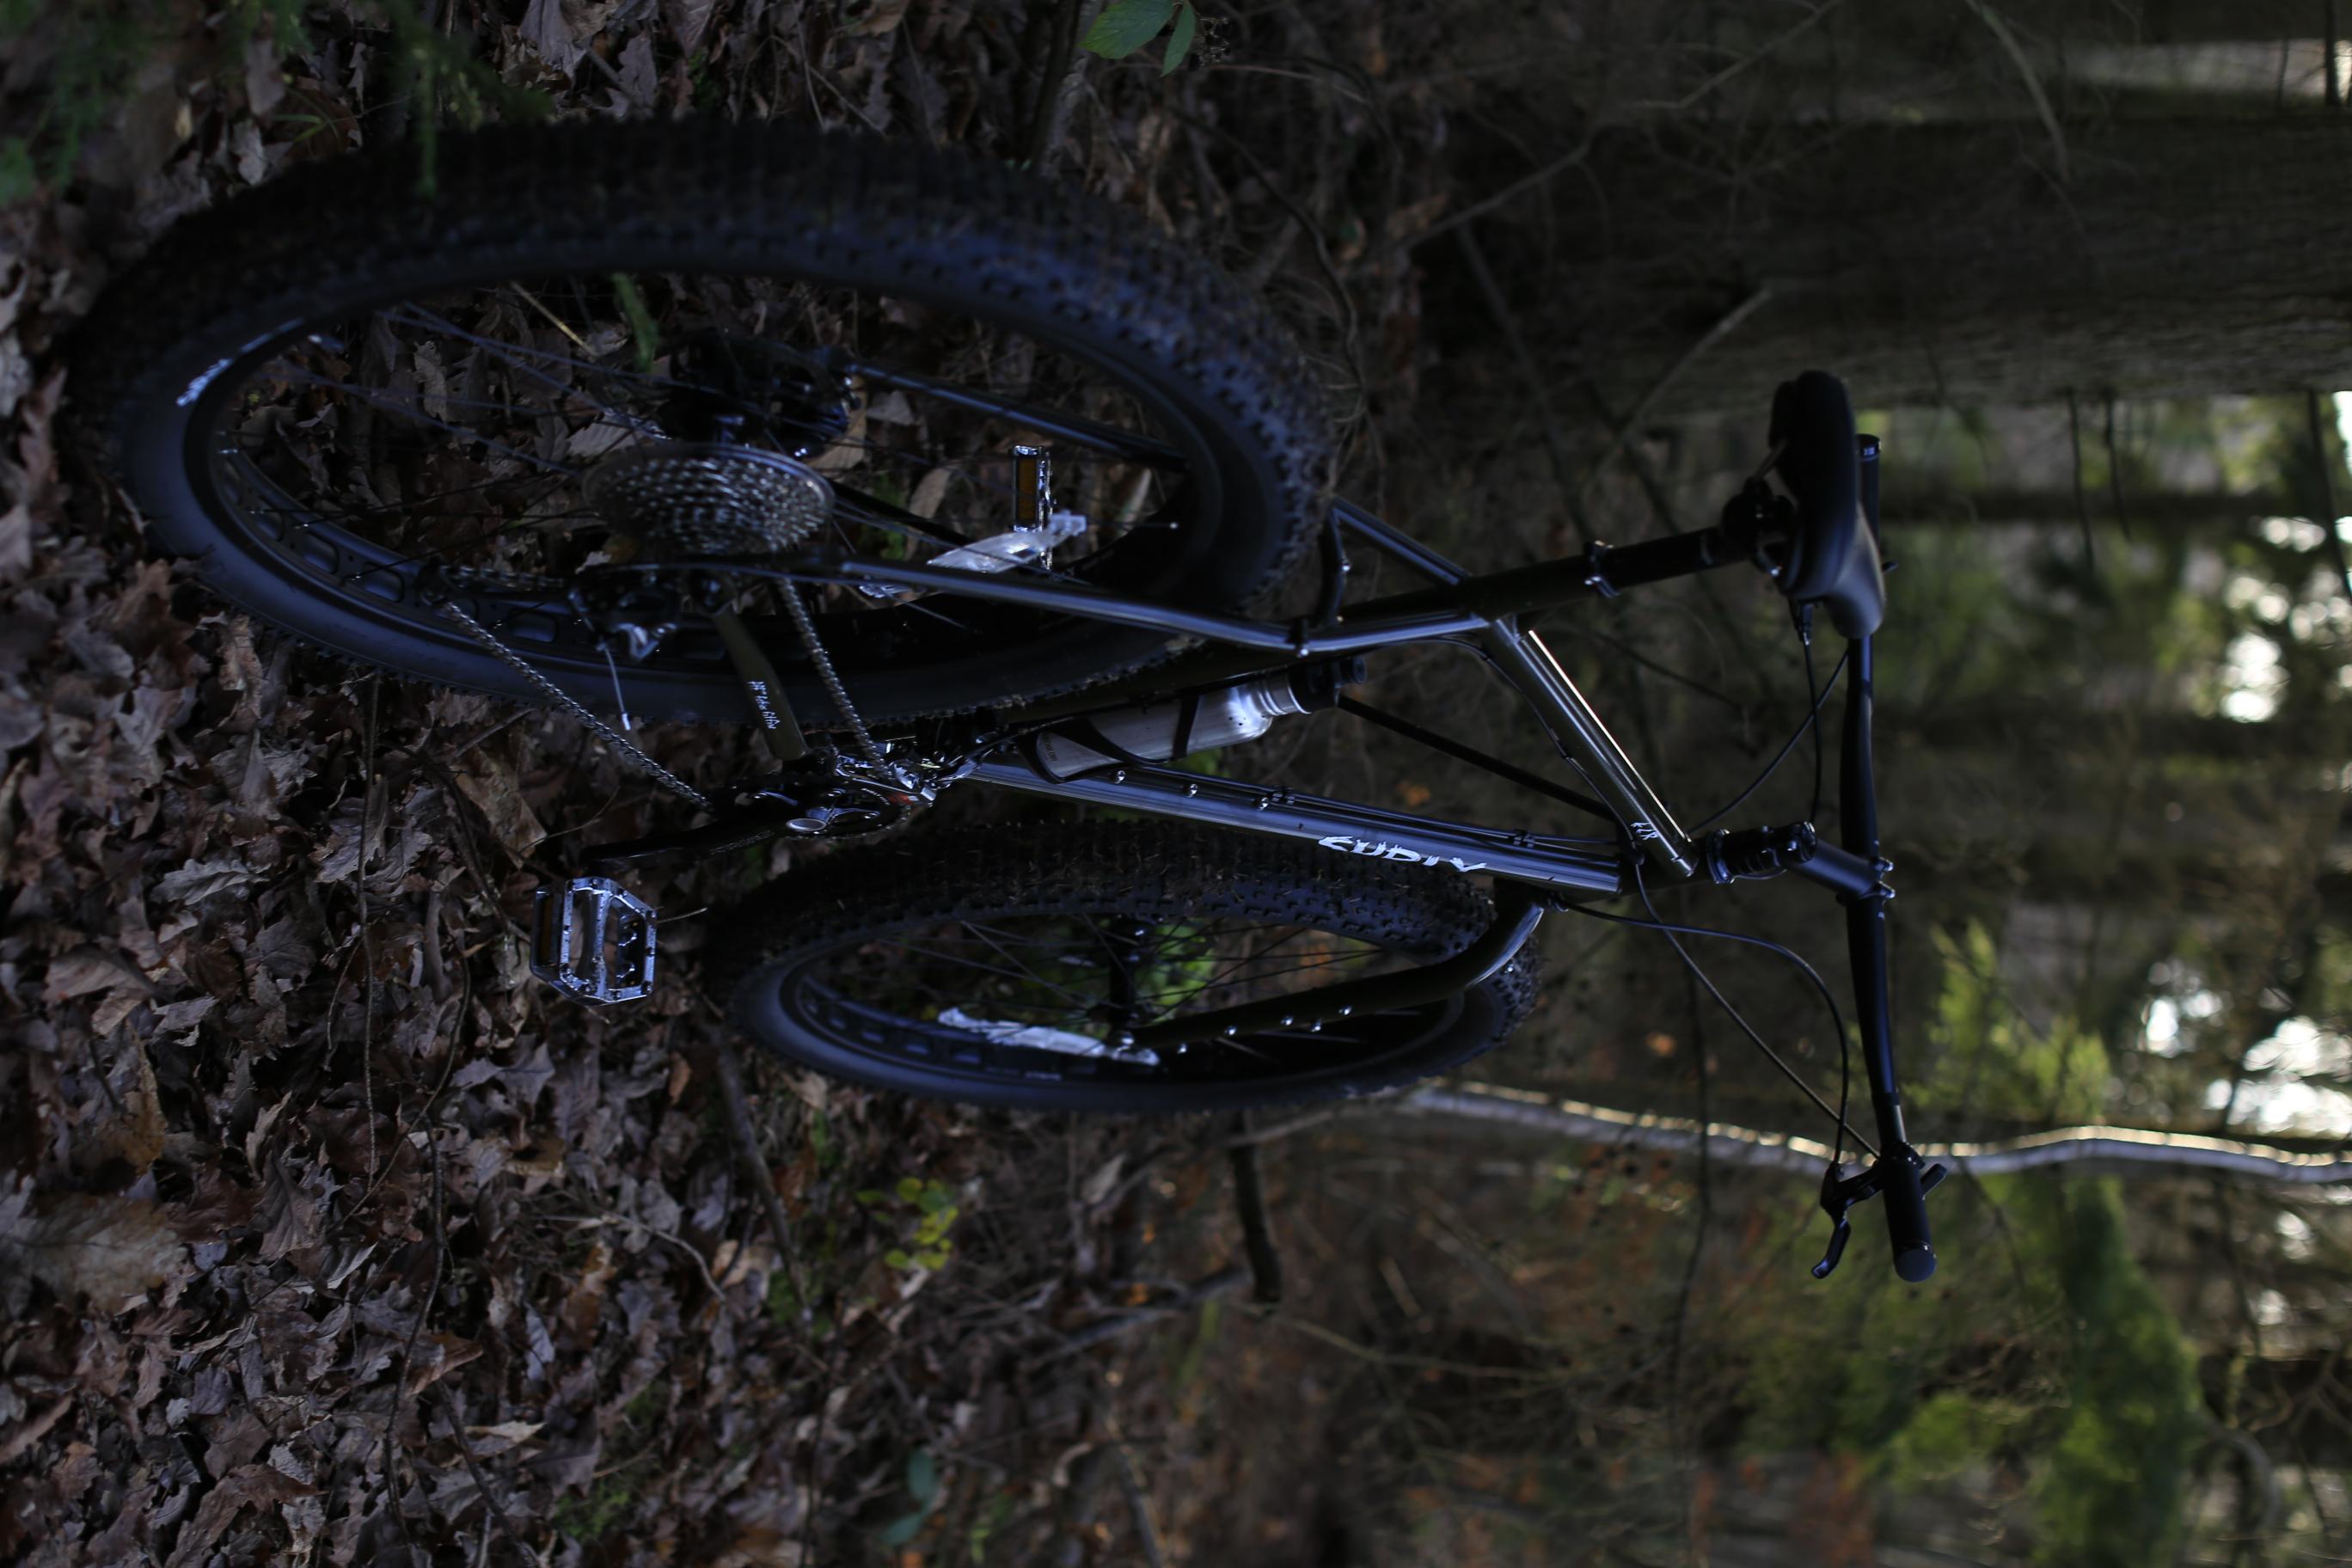 surly, Surly ECR, fat bike, bikepacking, 29er, knards, tarp, pedalingnowhere, whileoutriding